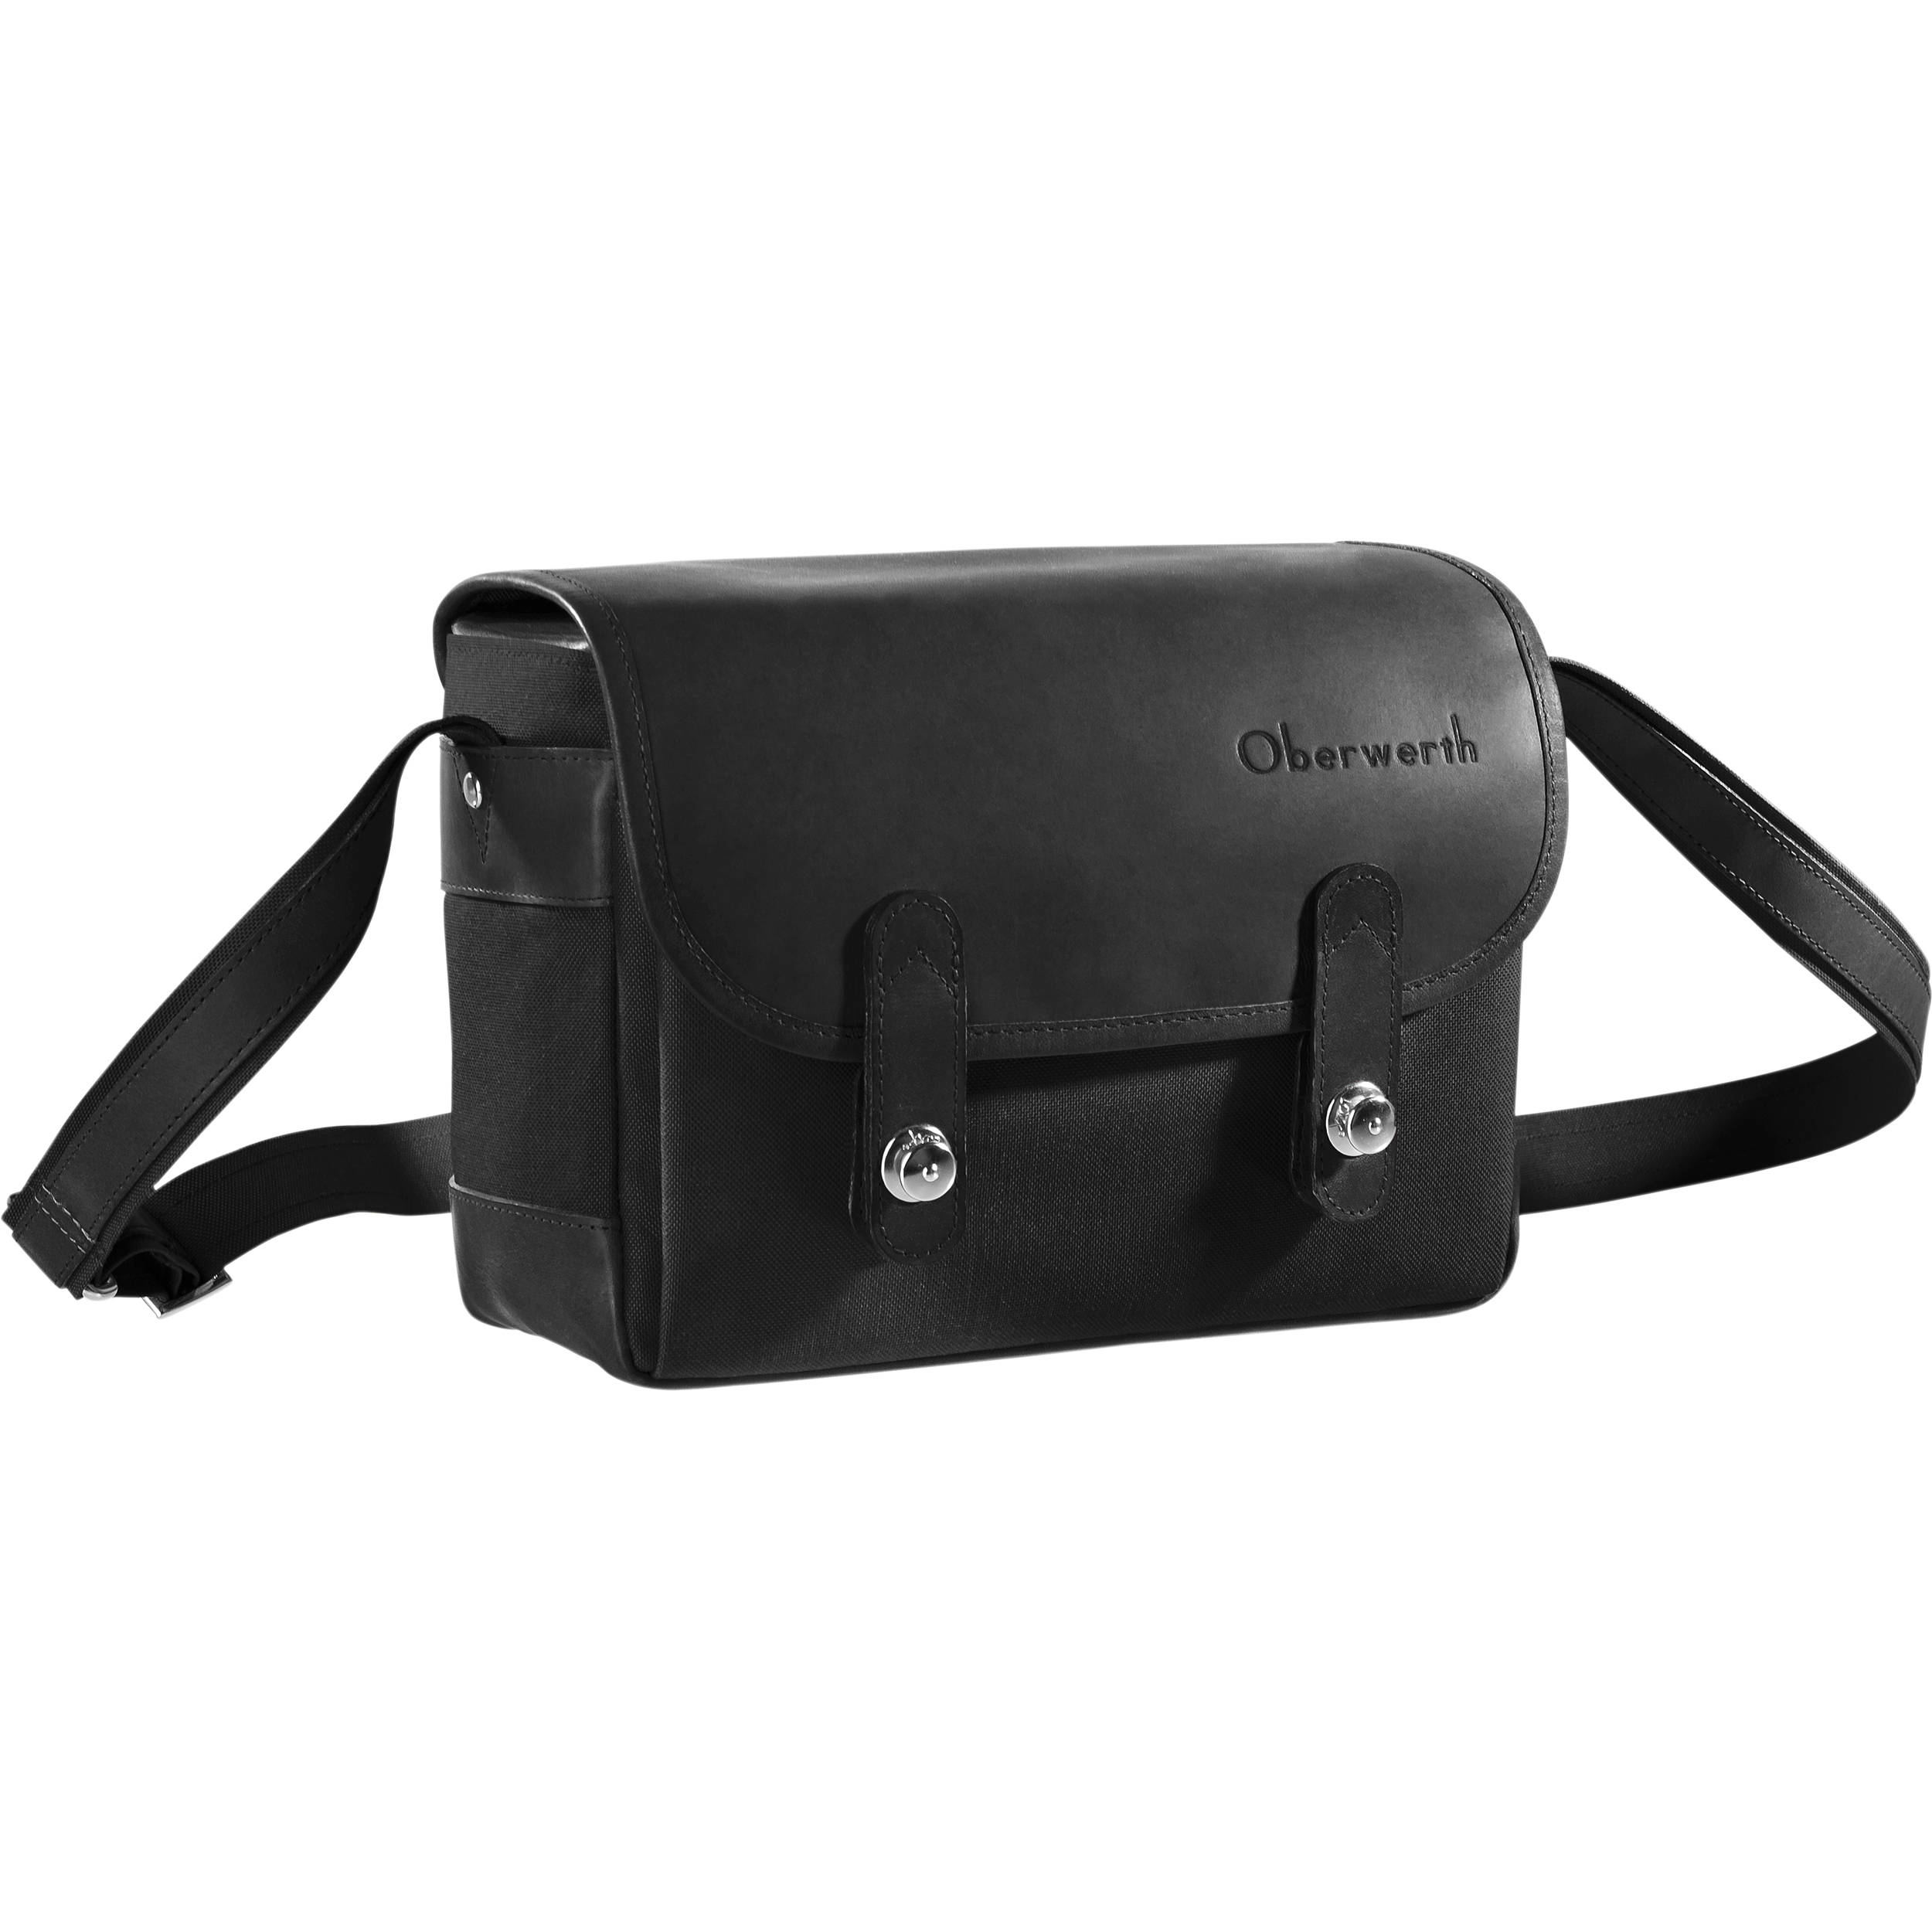 Oberwerth Freiburg Small Camera Bag Black Black F Cs Ls 101